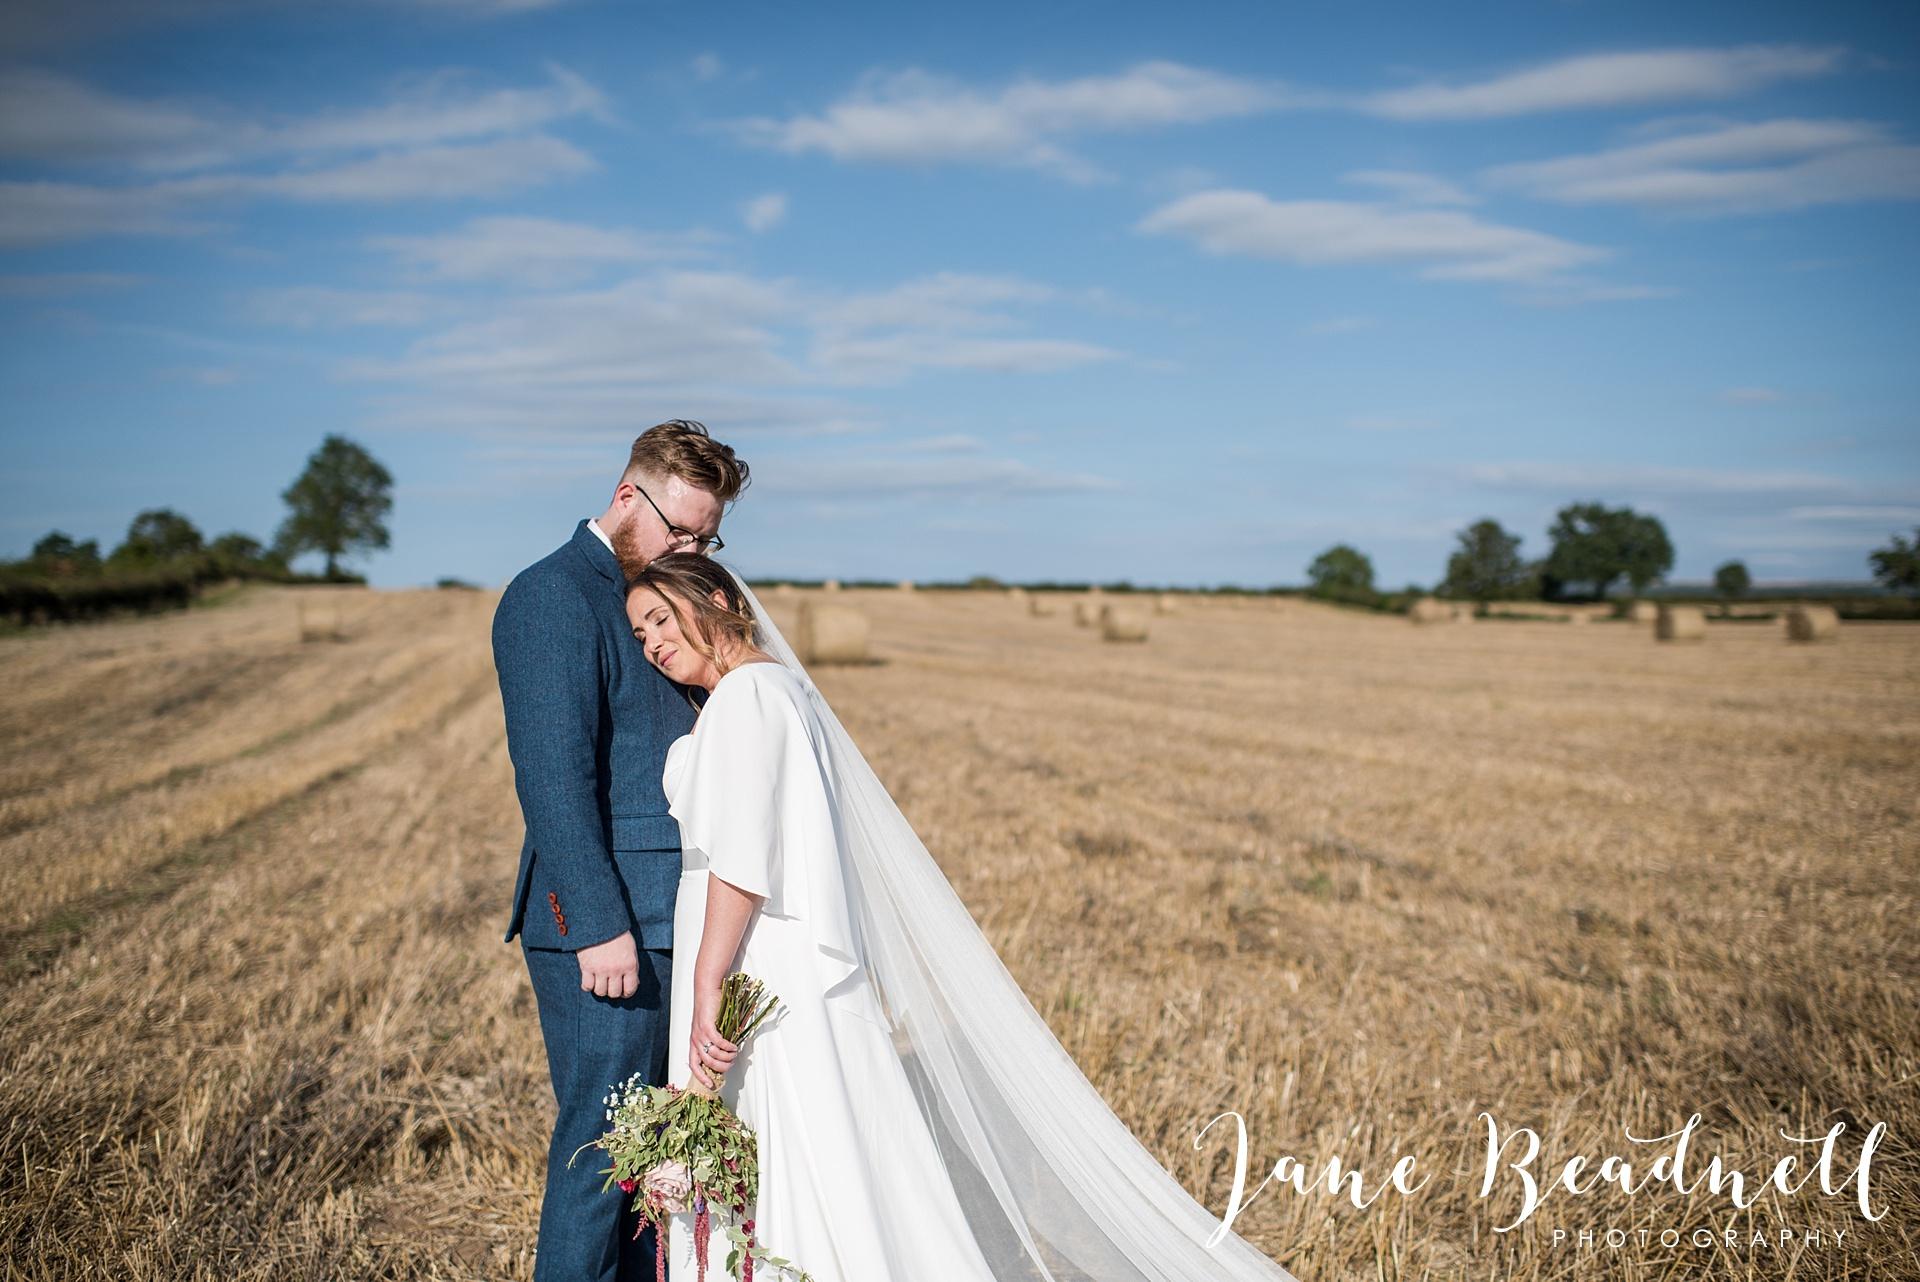 fine-art-wedding-photographer-jane-beadnell-yorkshire-wedding-photographer_0065